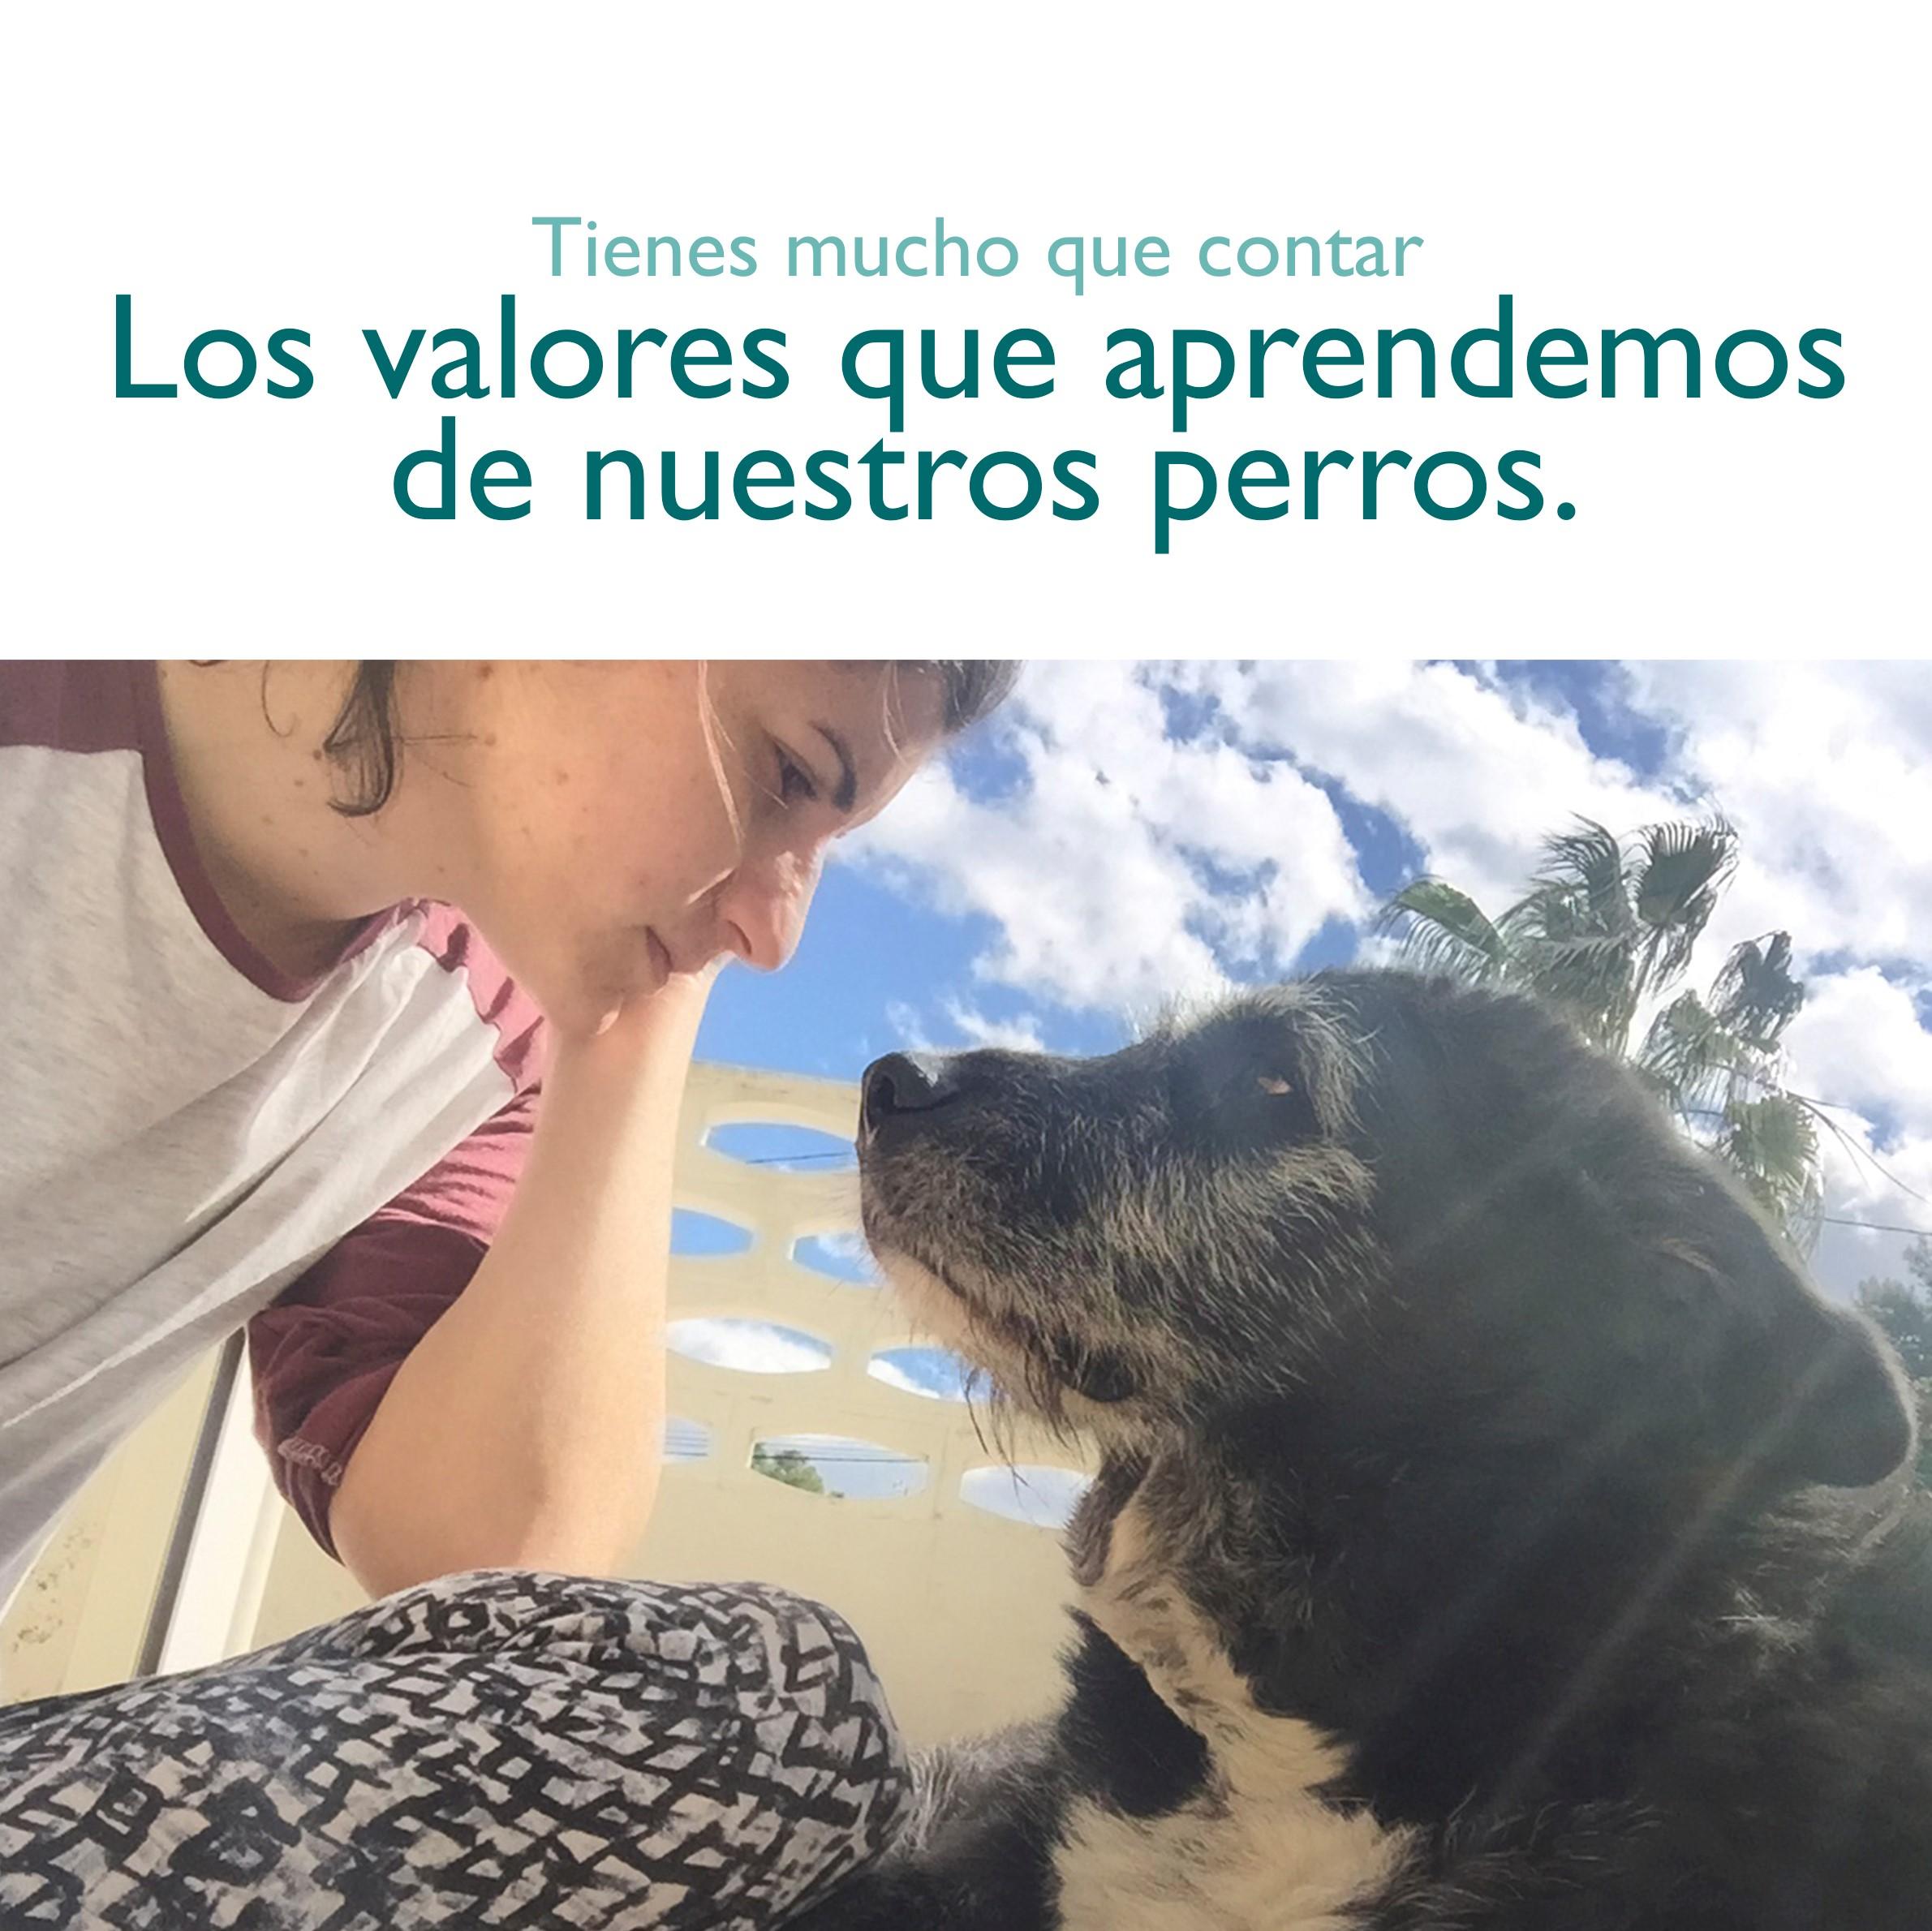 dogsanimal-taller-valores-emocion-animal-perros-comunicacion-mercado-autoras